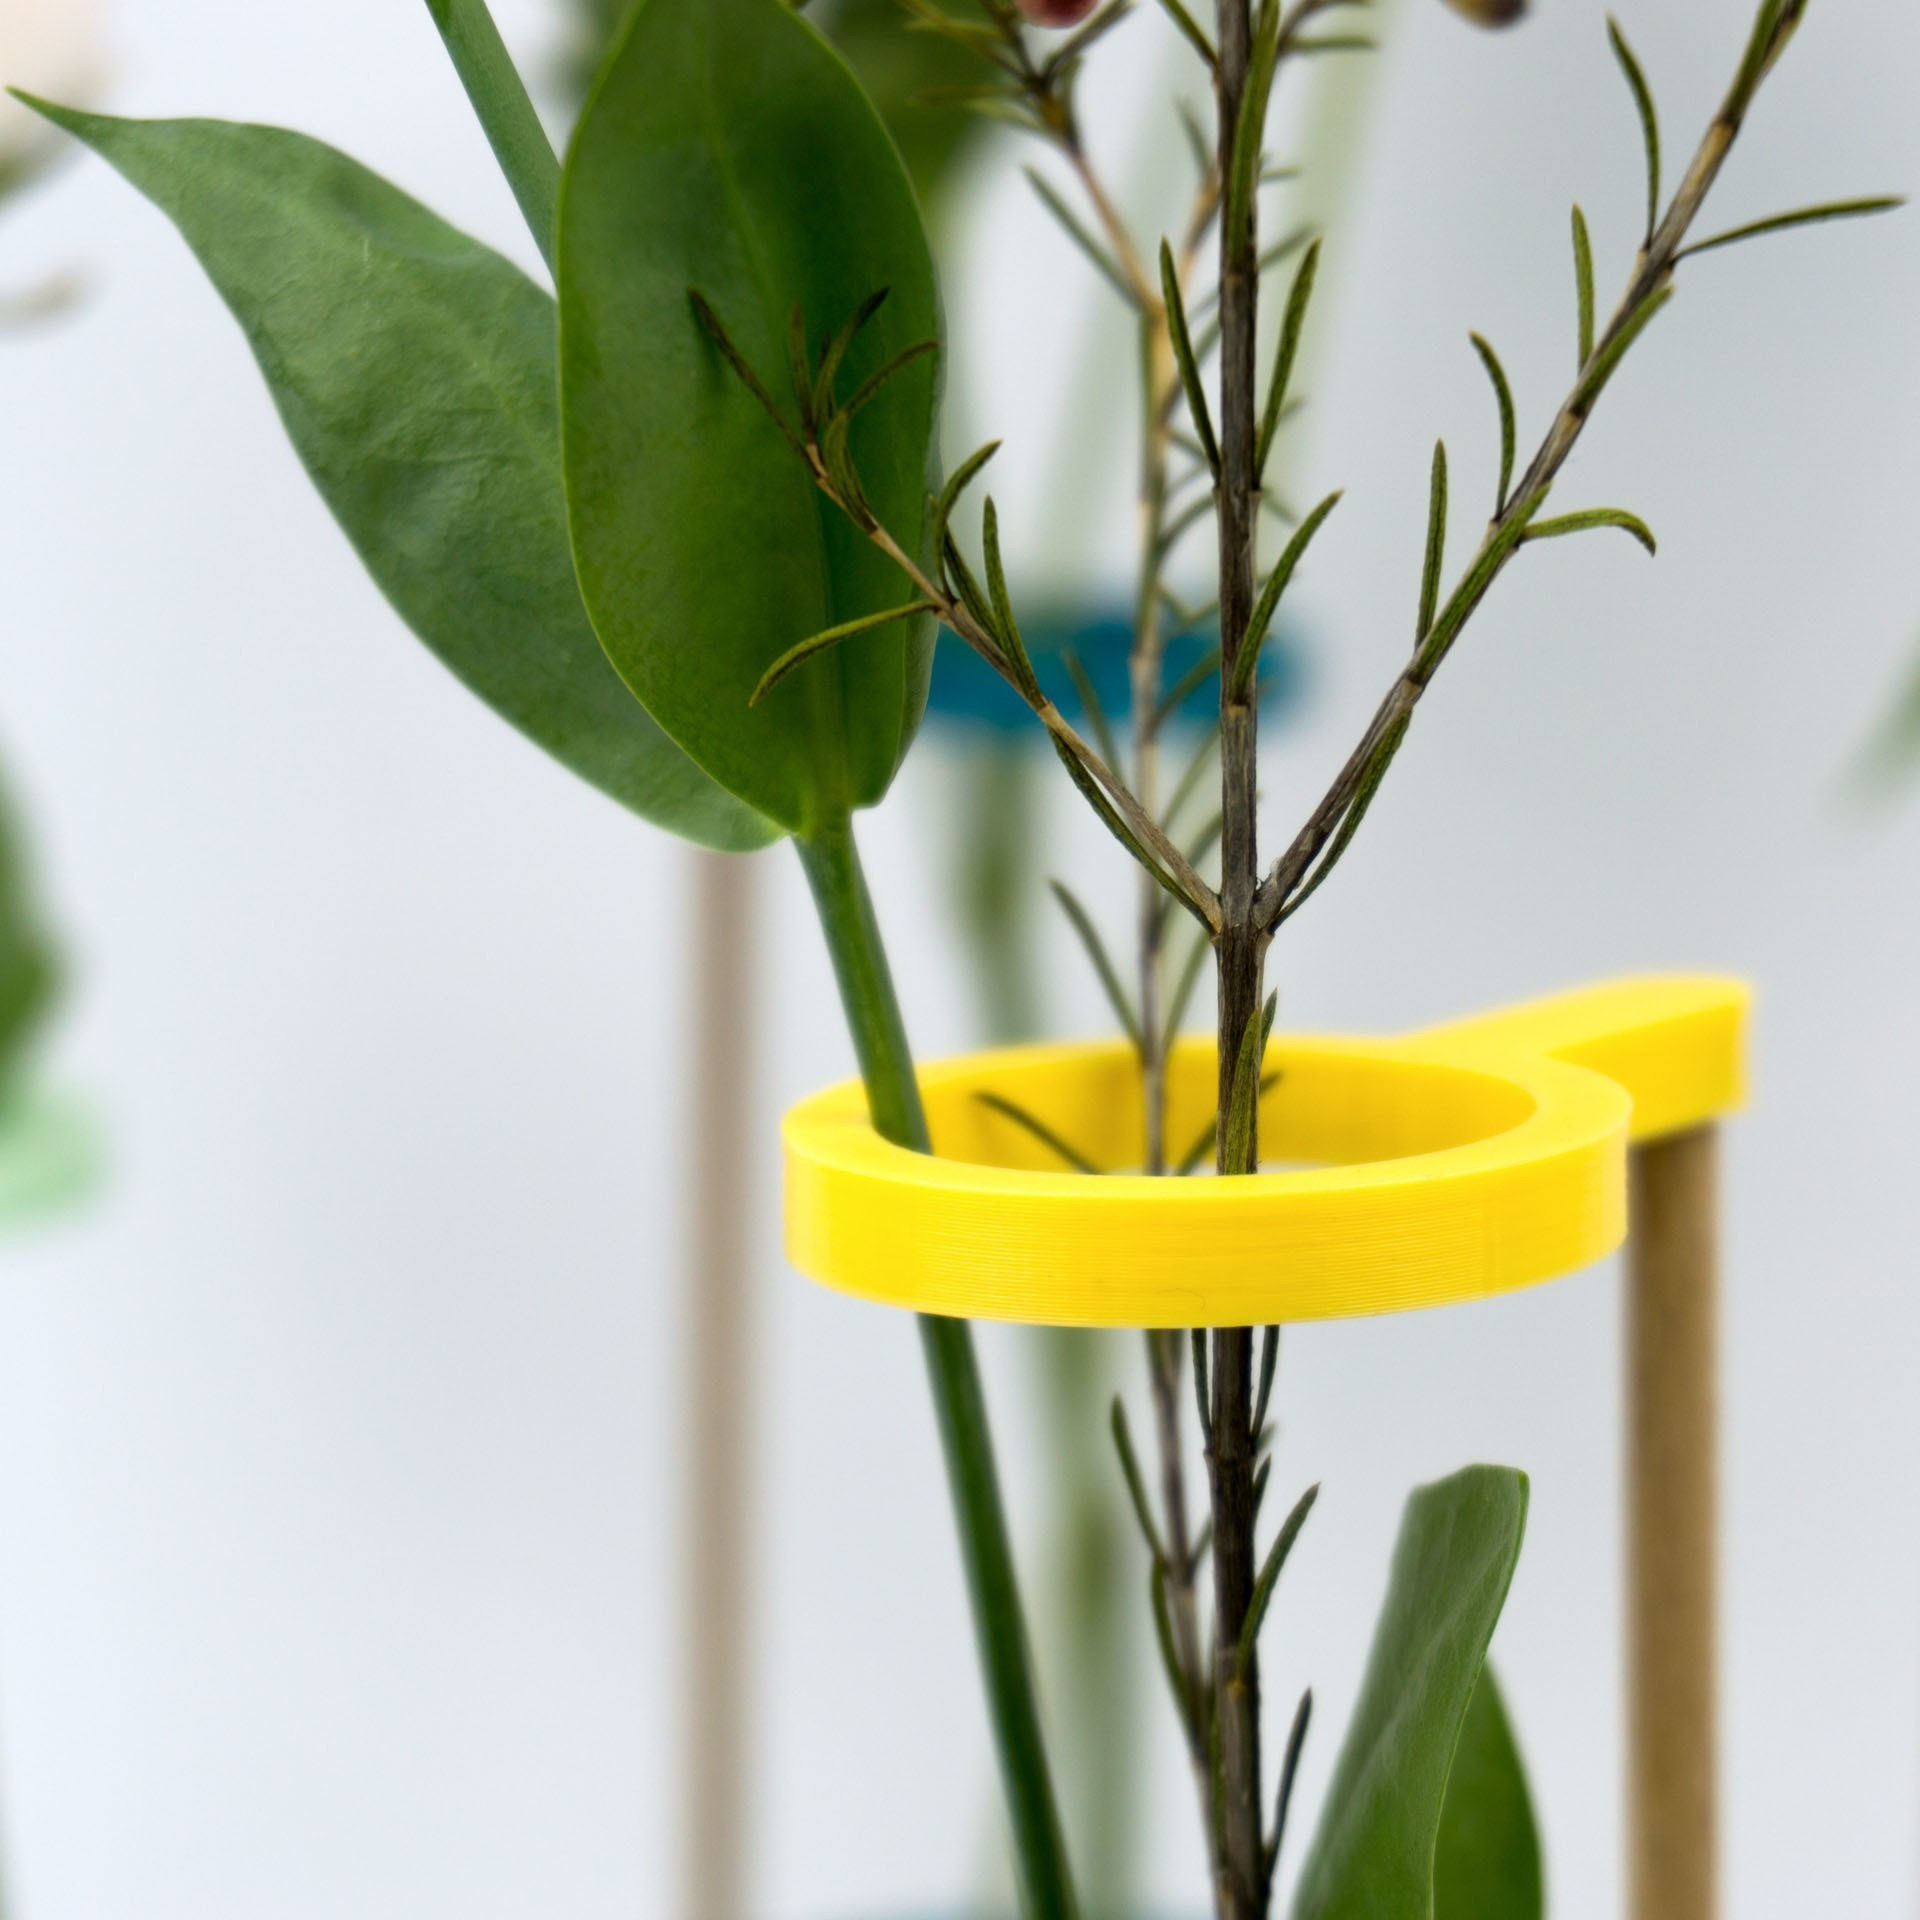 Shooting Pots et impression 3D - 2018 02 10 - 2.jpg Download STL file Stem vase / Vase to be fixed on a glass pot • 3D print object, Jonathan-AtelierVOUS